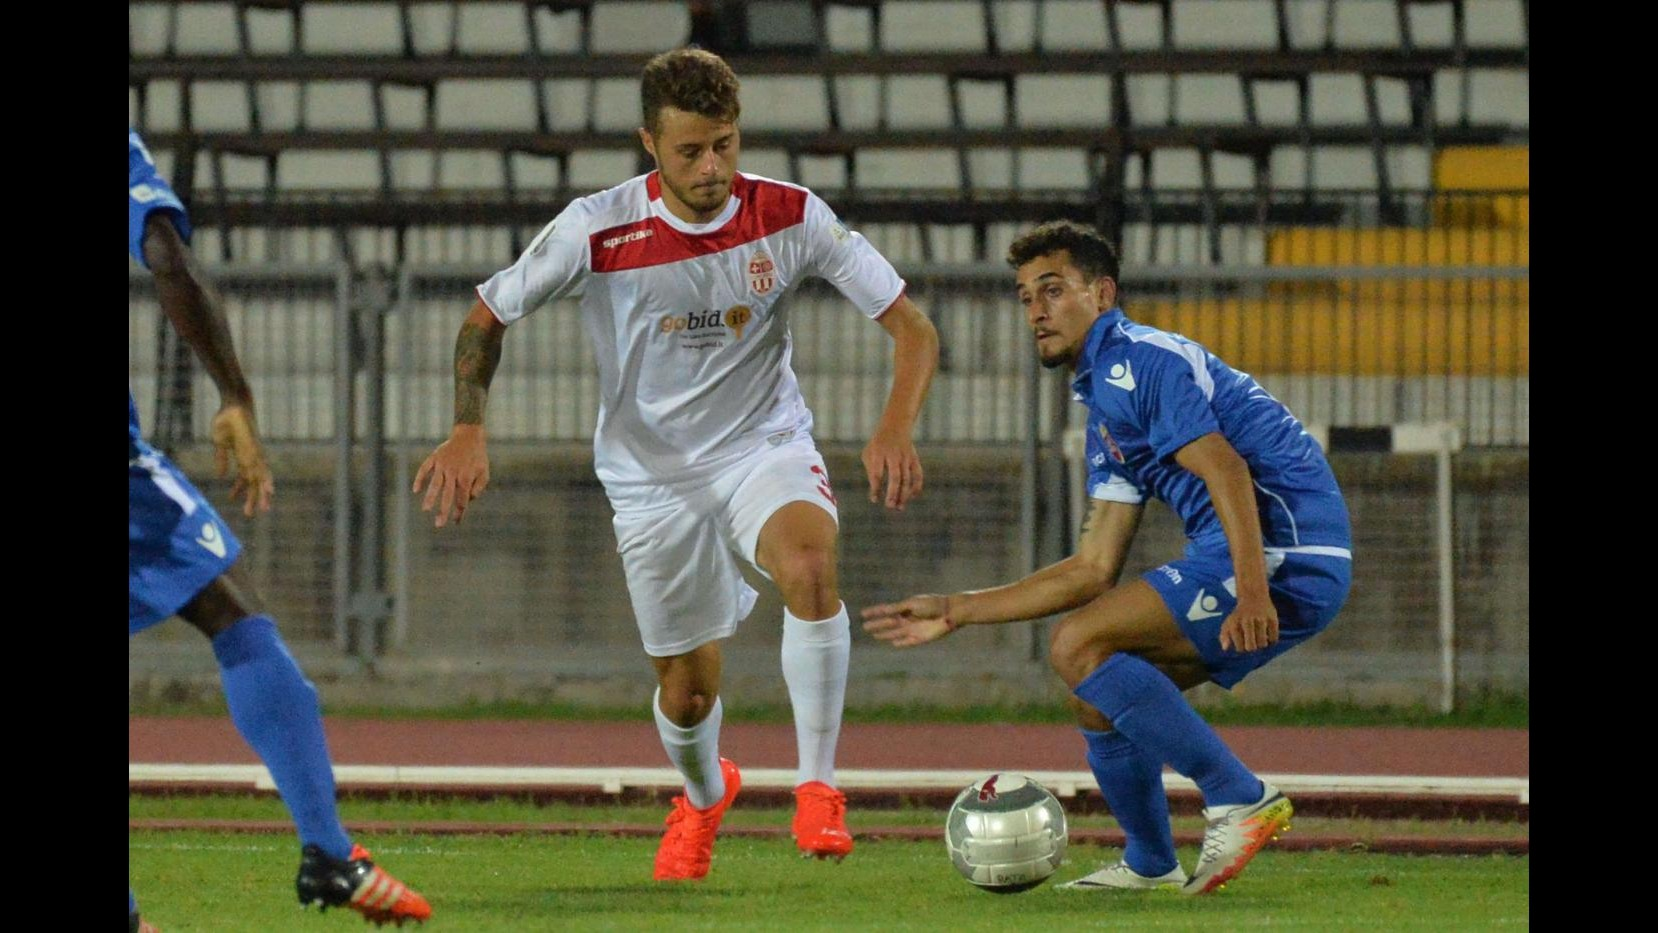 FOTO Lega Pro, Maceratese-Ancona 0-0